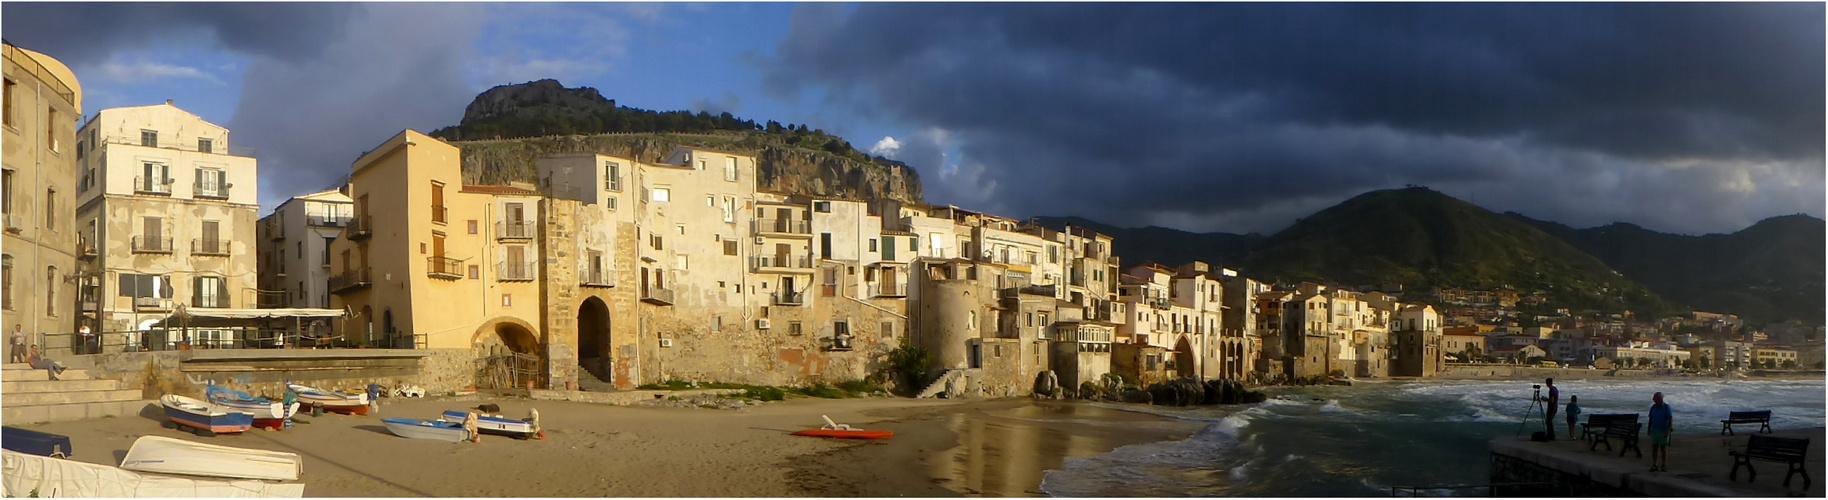 Cefalu (Sizilien)